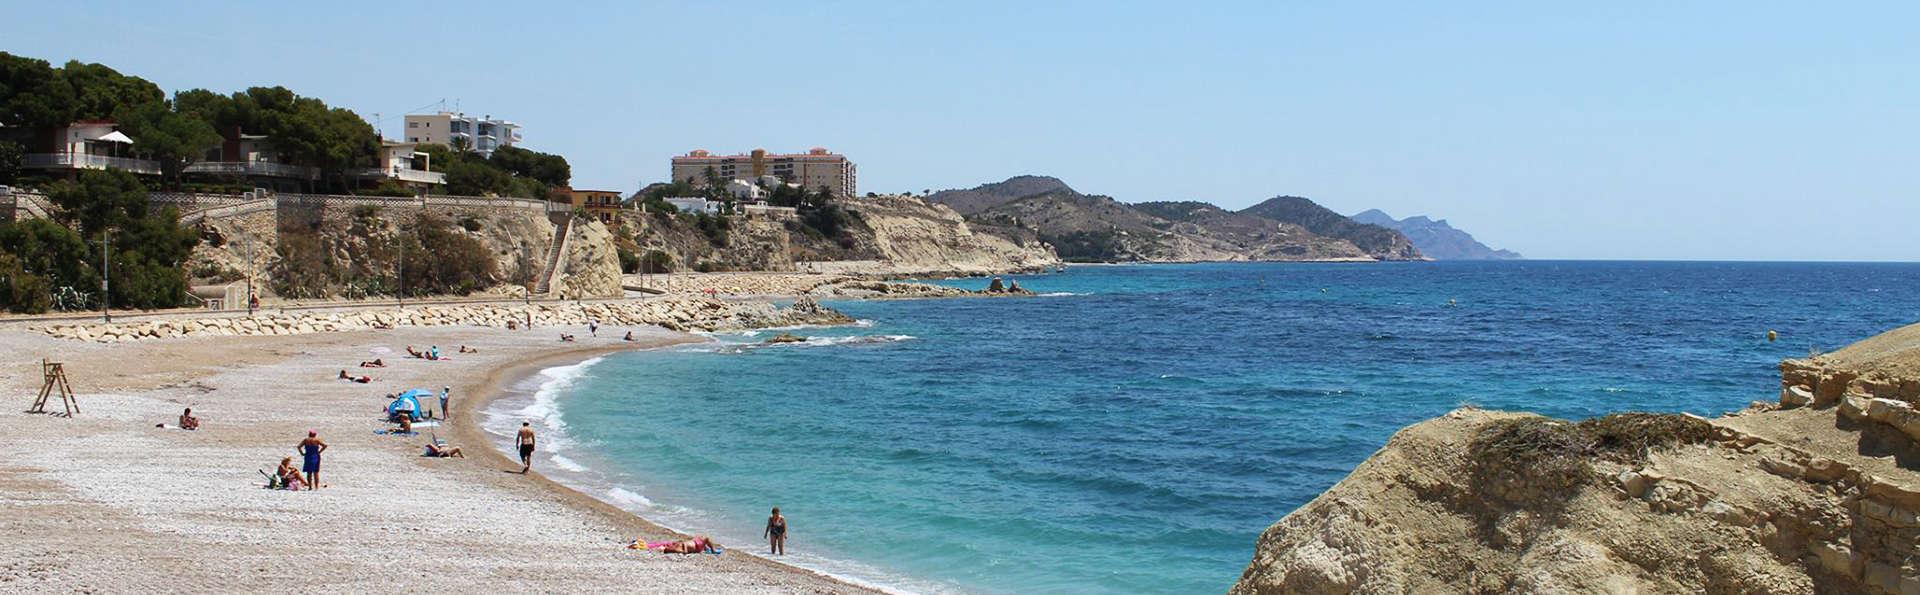 Hotel Allon Mediterrània - EDIT_destination1.jpg